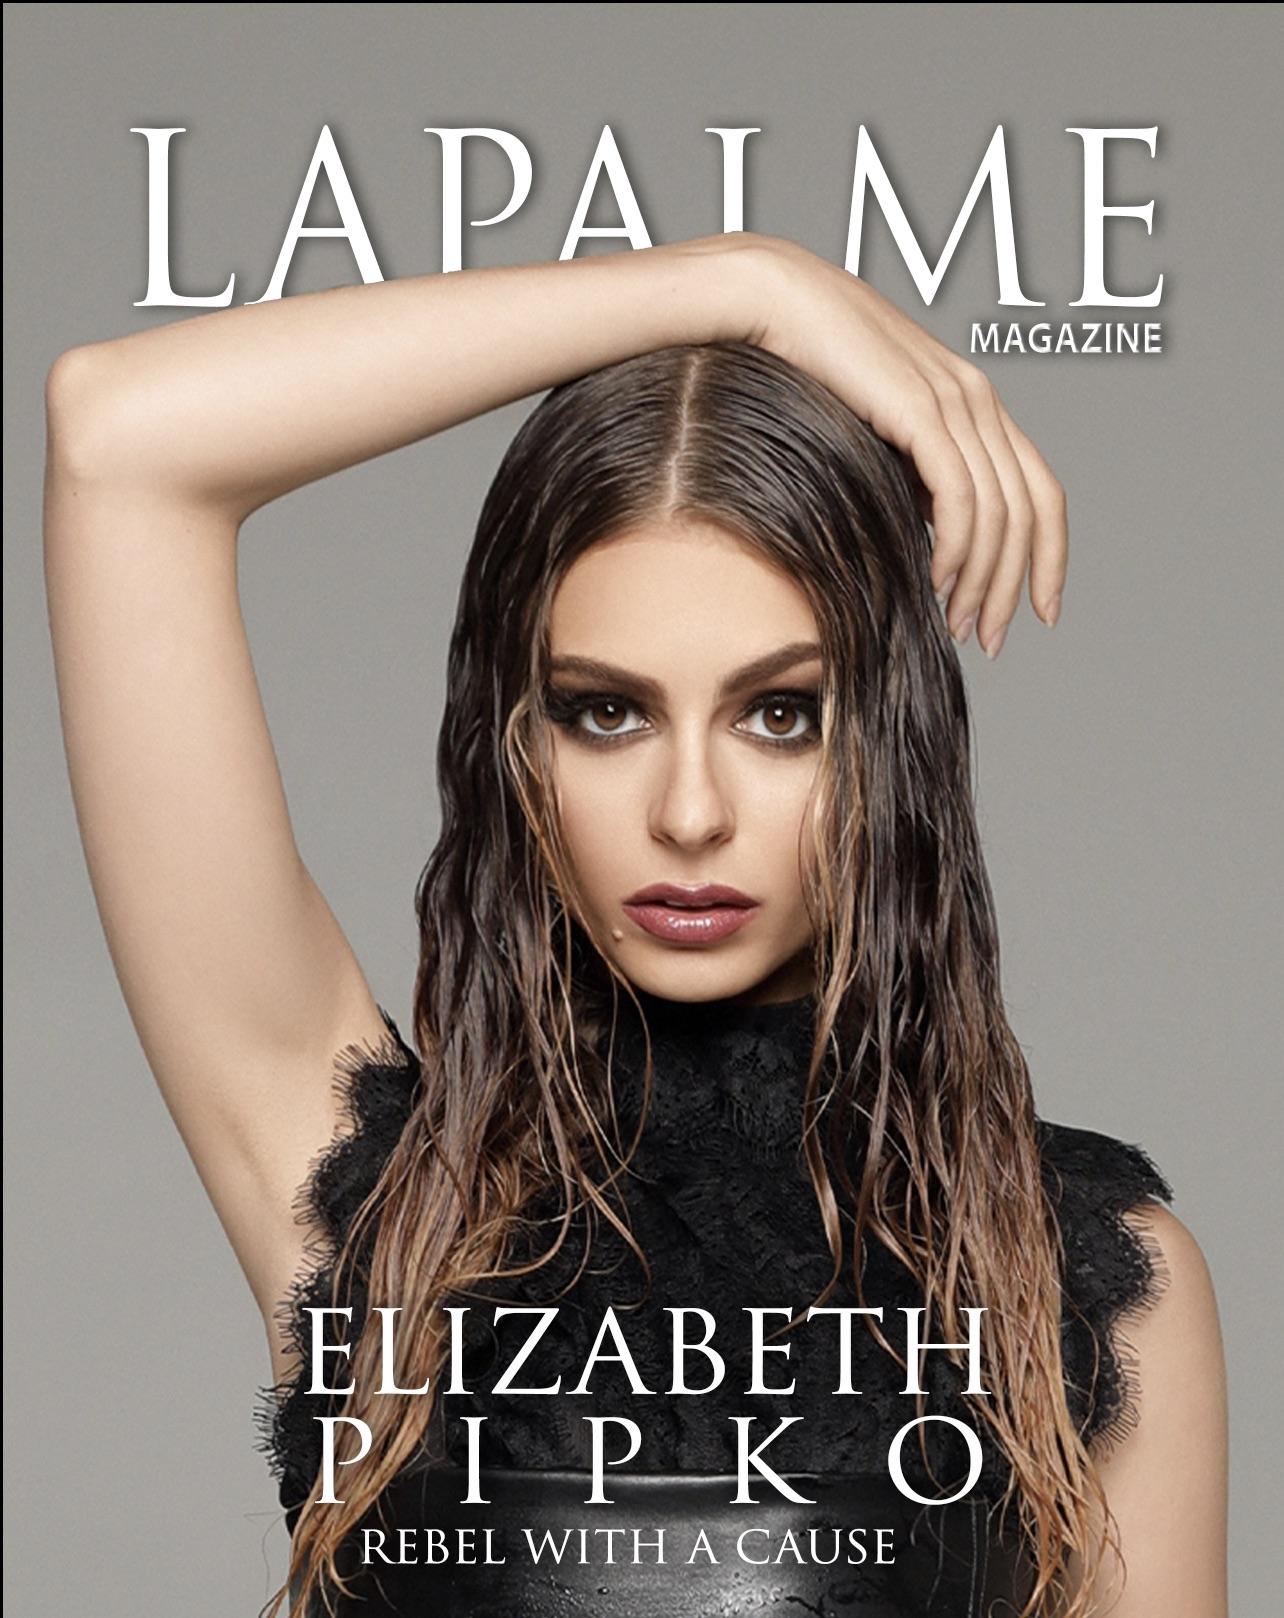 Elizabeth Pipko Lapalme Magazines Fall Women's Issue 2021 (Photo credit: Filbert Kung @filbert_kung)